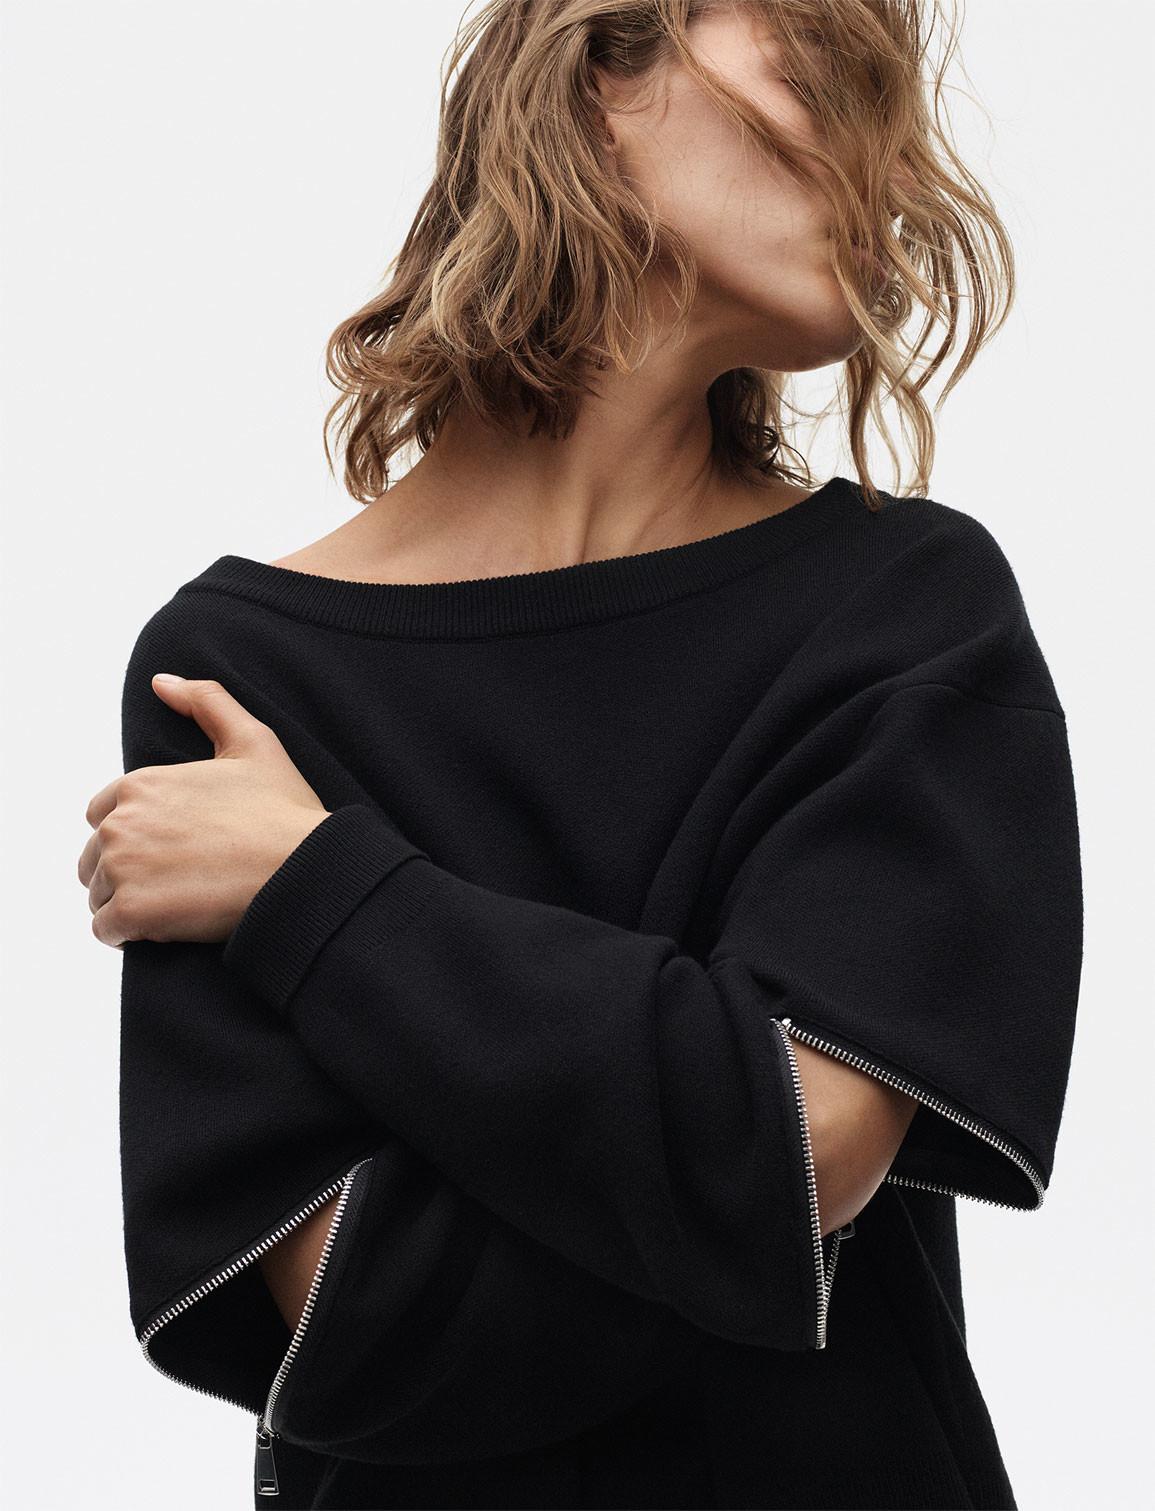 Foto de Zara editorial knit 2017 (7/11)